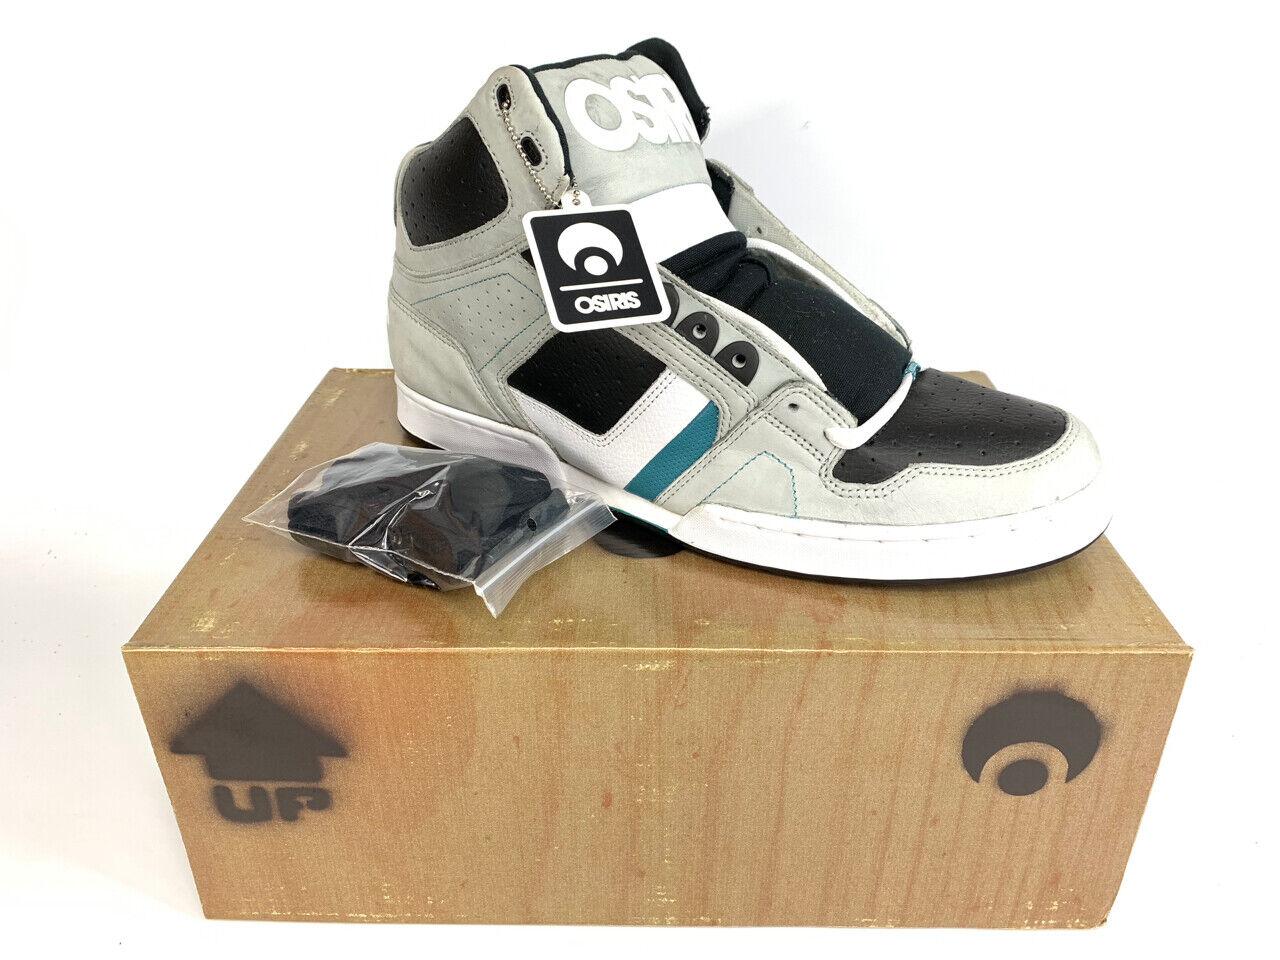 NEW IN BOX OSIRIS BRONX 1130354 Skateboard Skate Shoe NOS New Old Stock